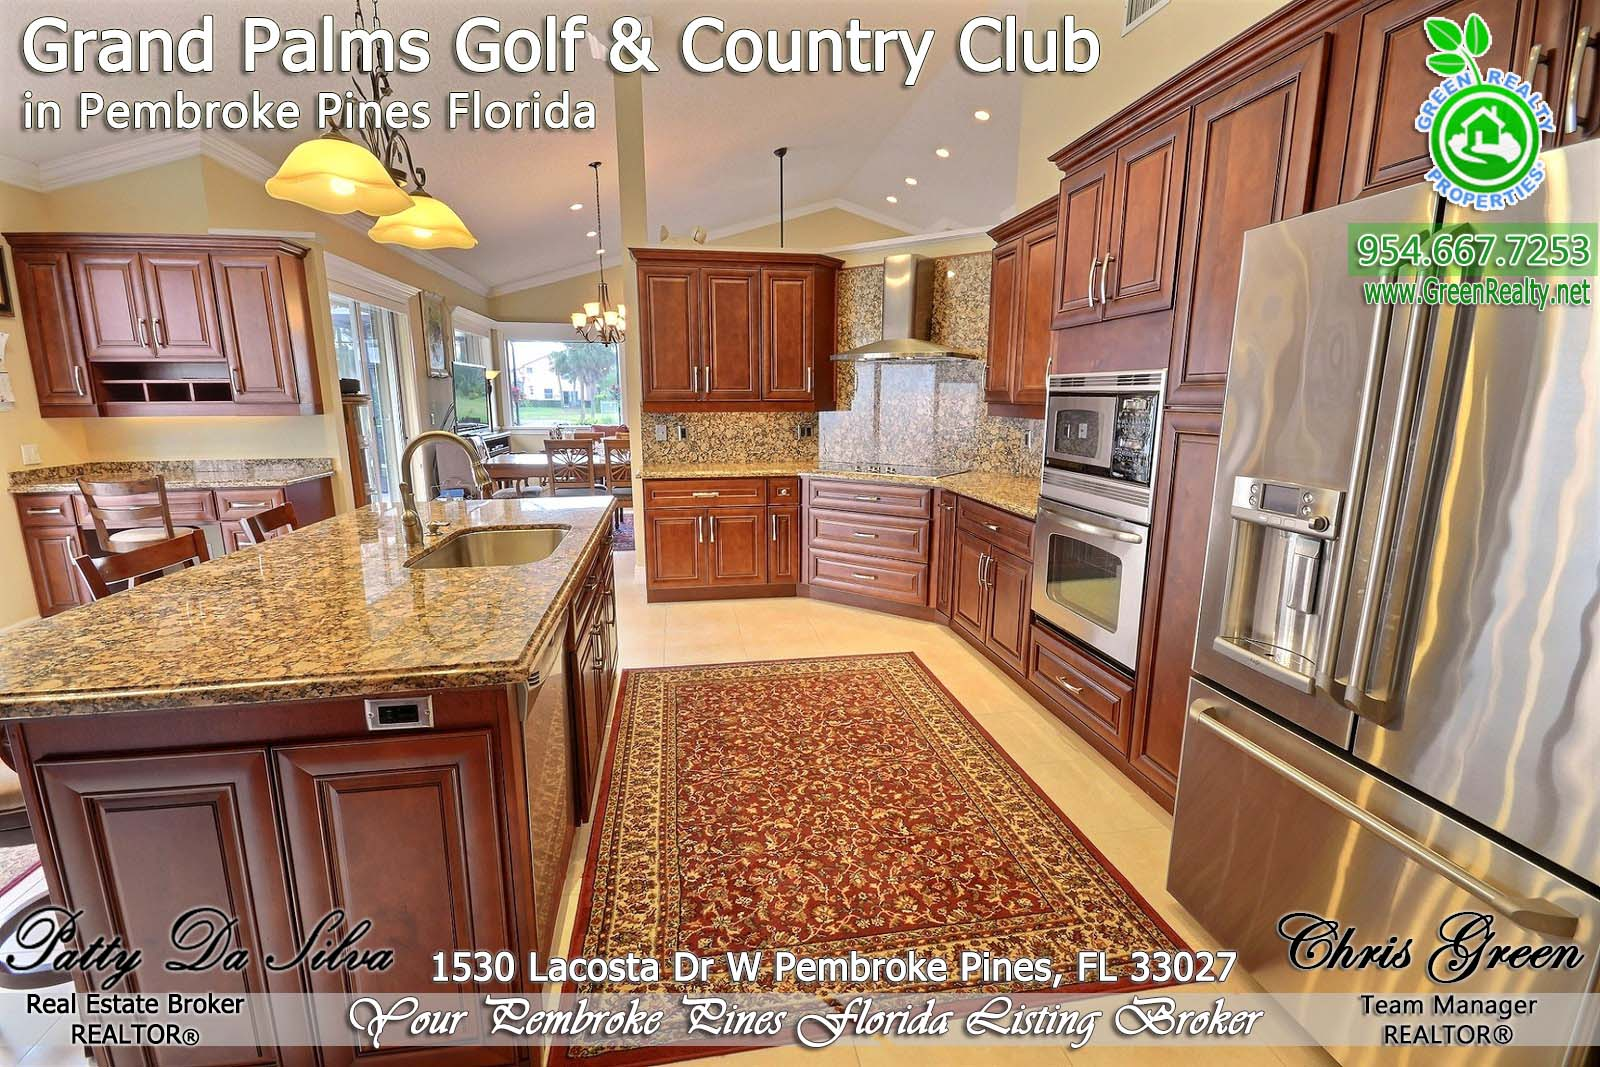 Pembroke Pines Real Estate in Florida